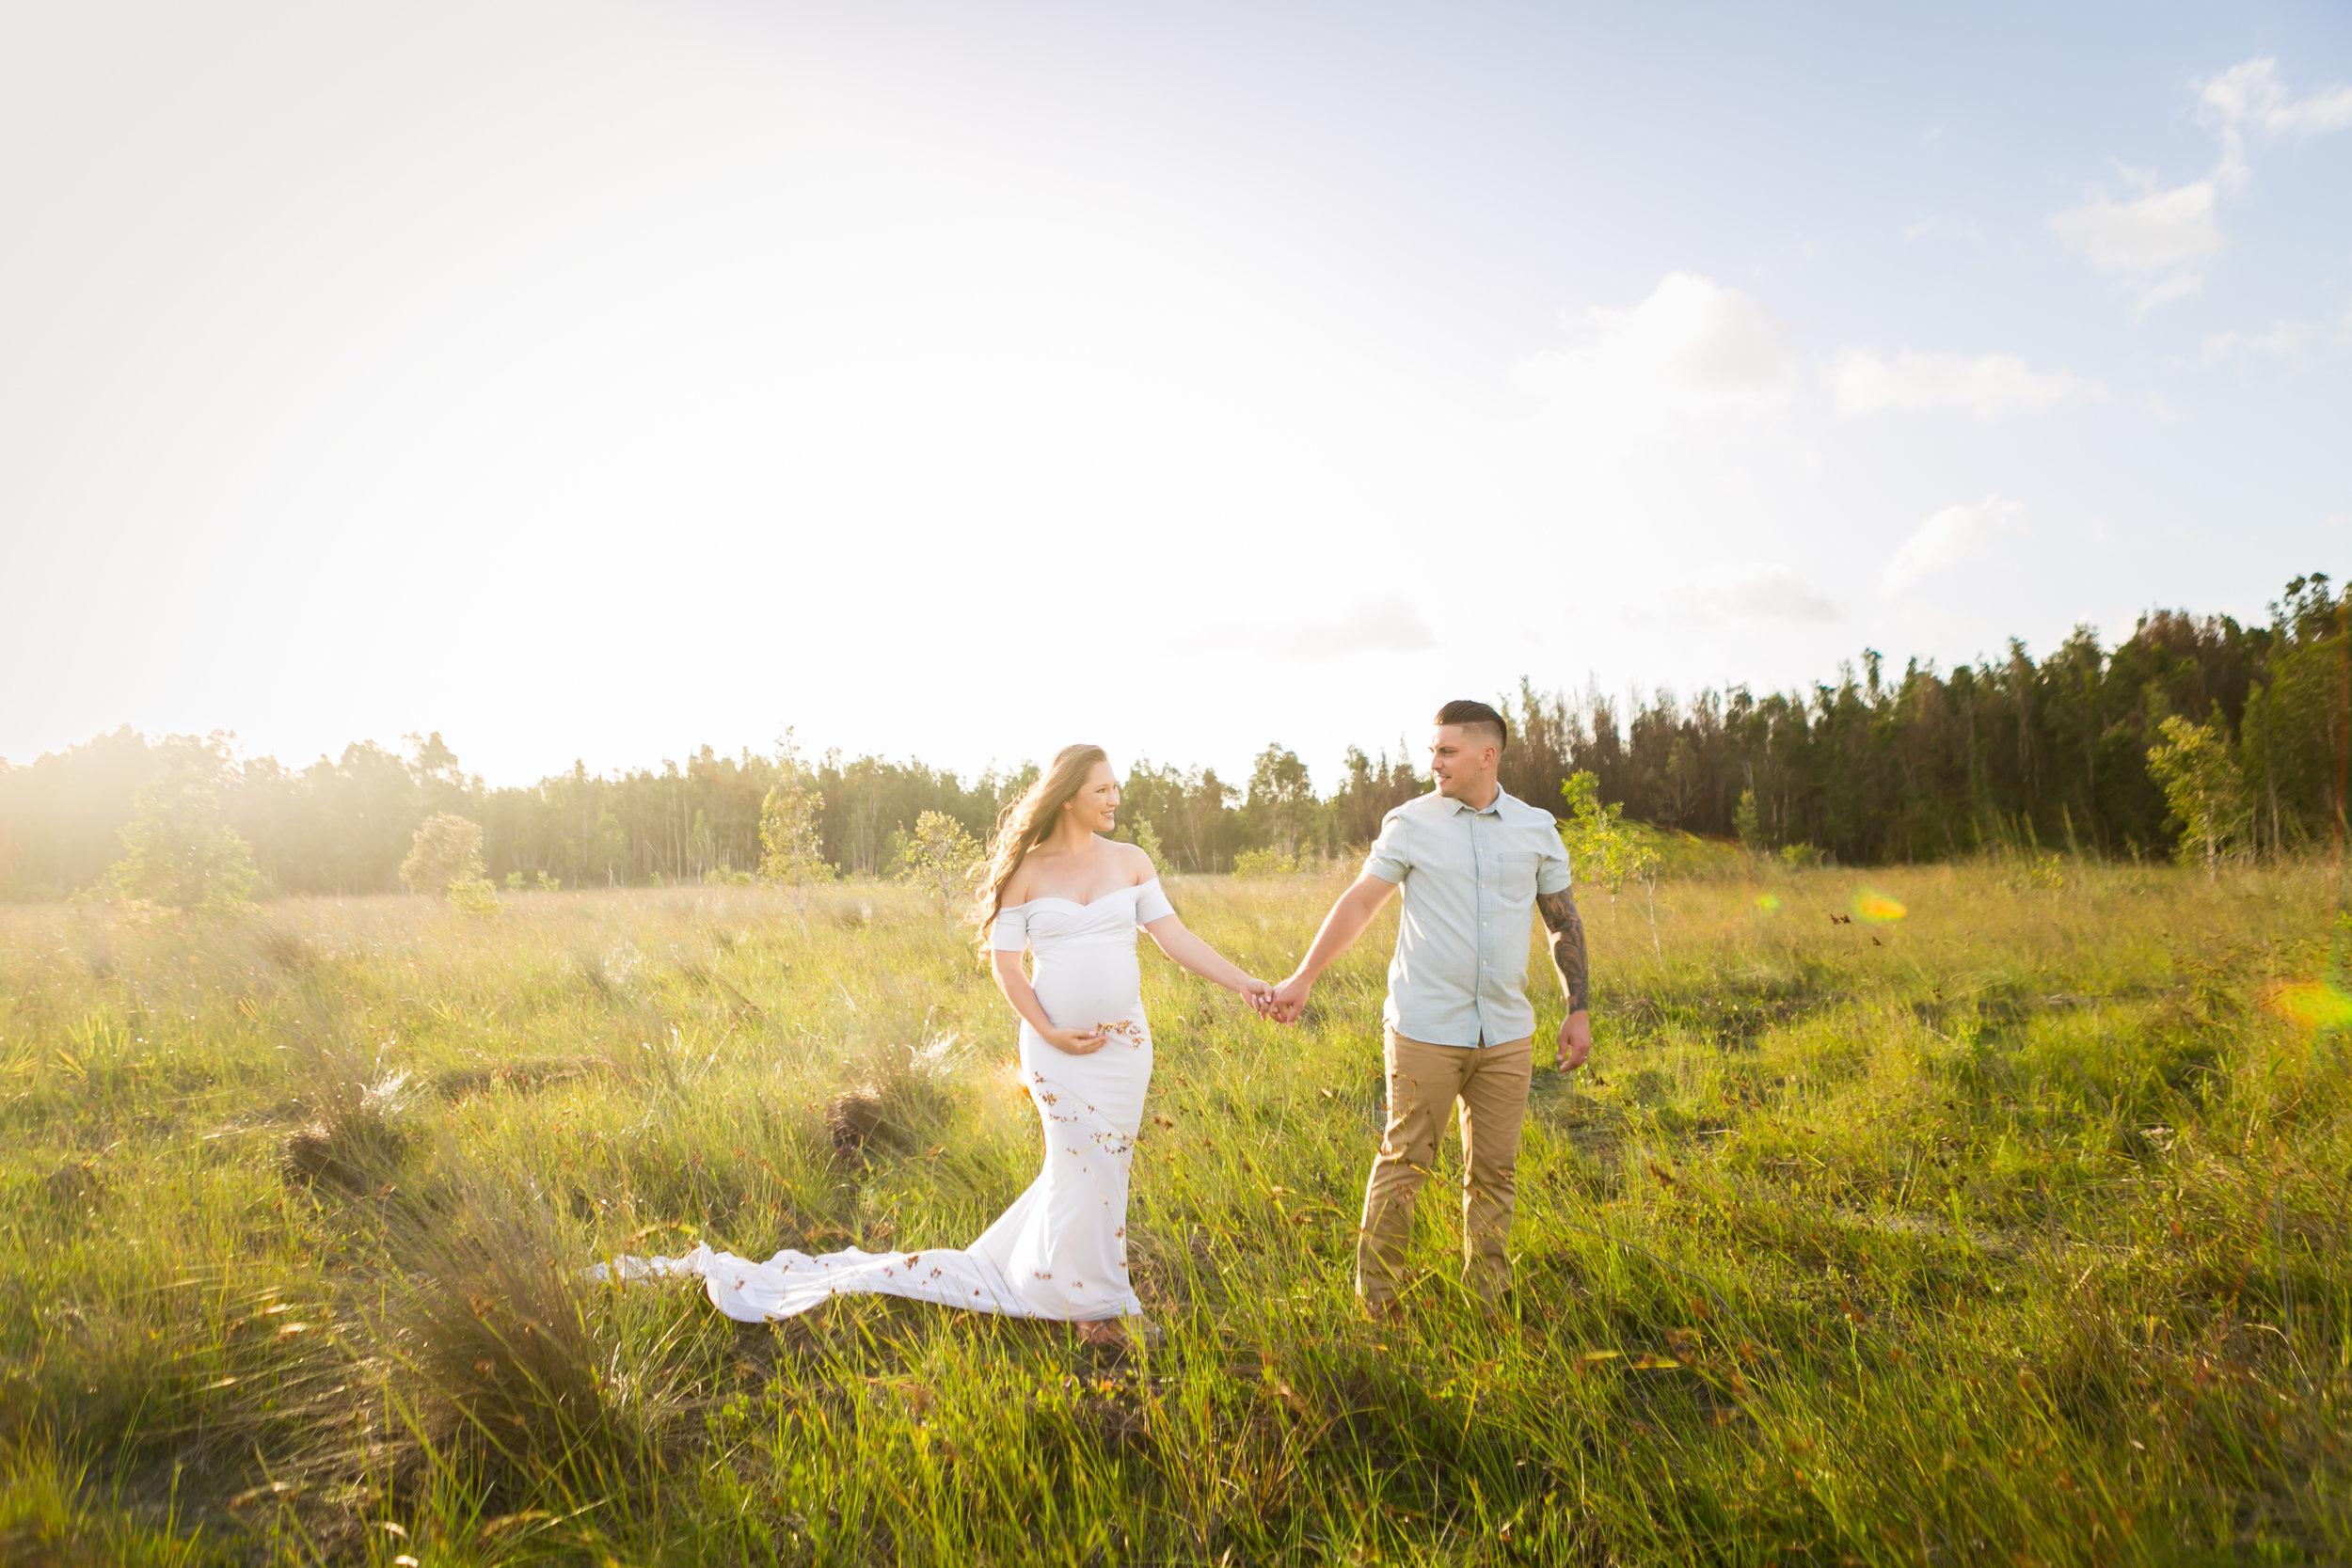 Maternity Photography Miami | Dipp Photography